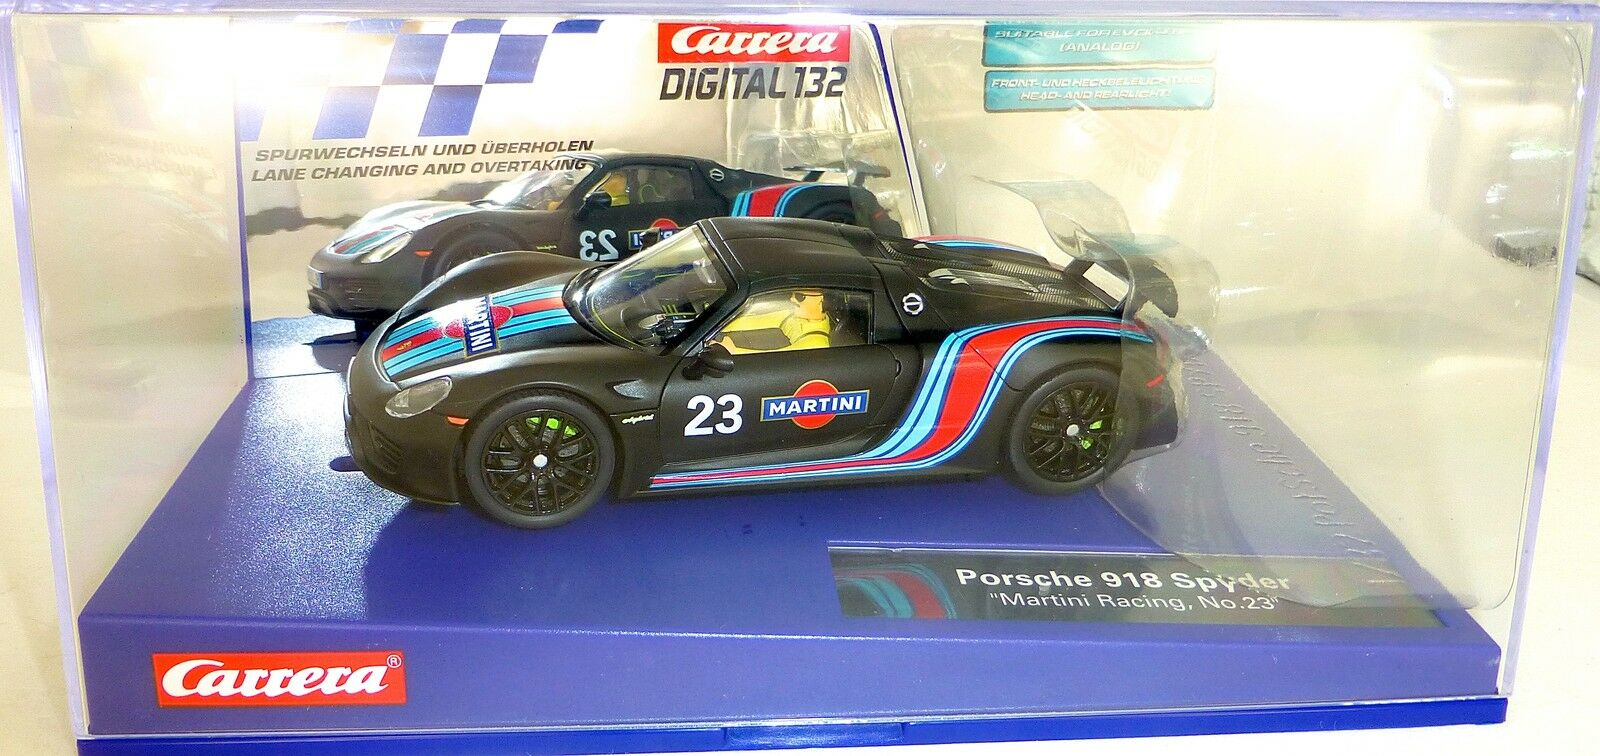 Martini Racing No 23 Porsche Porsche Porsche 918 Spyder Digital 132 Carrera 30691 Nuovo Conf. d7da7c